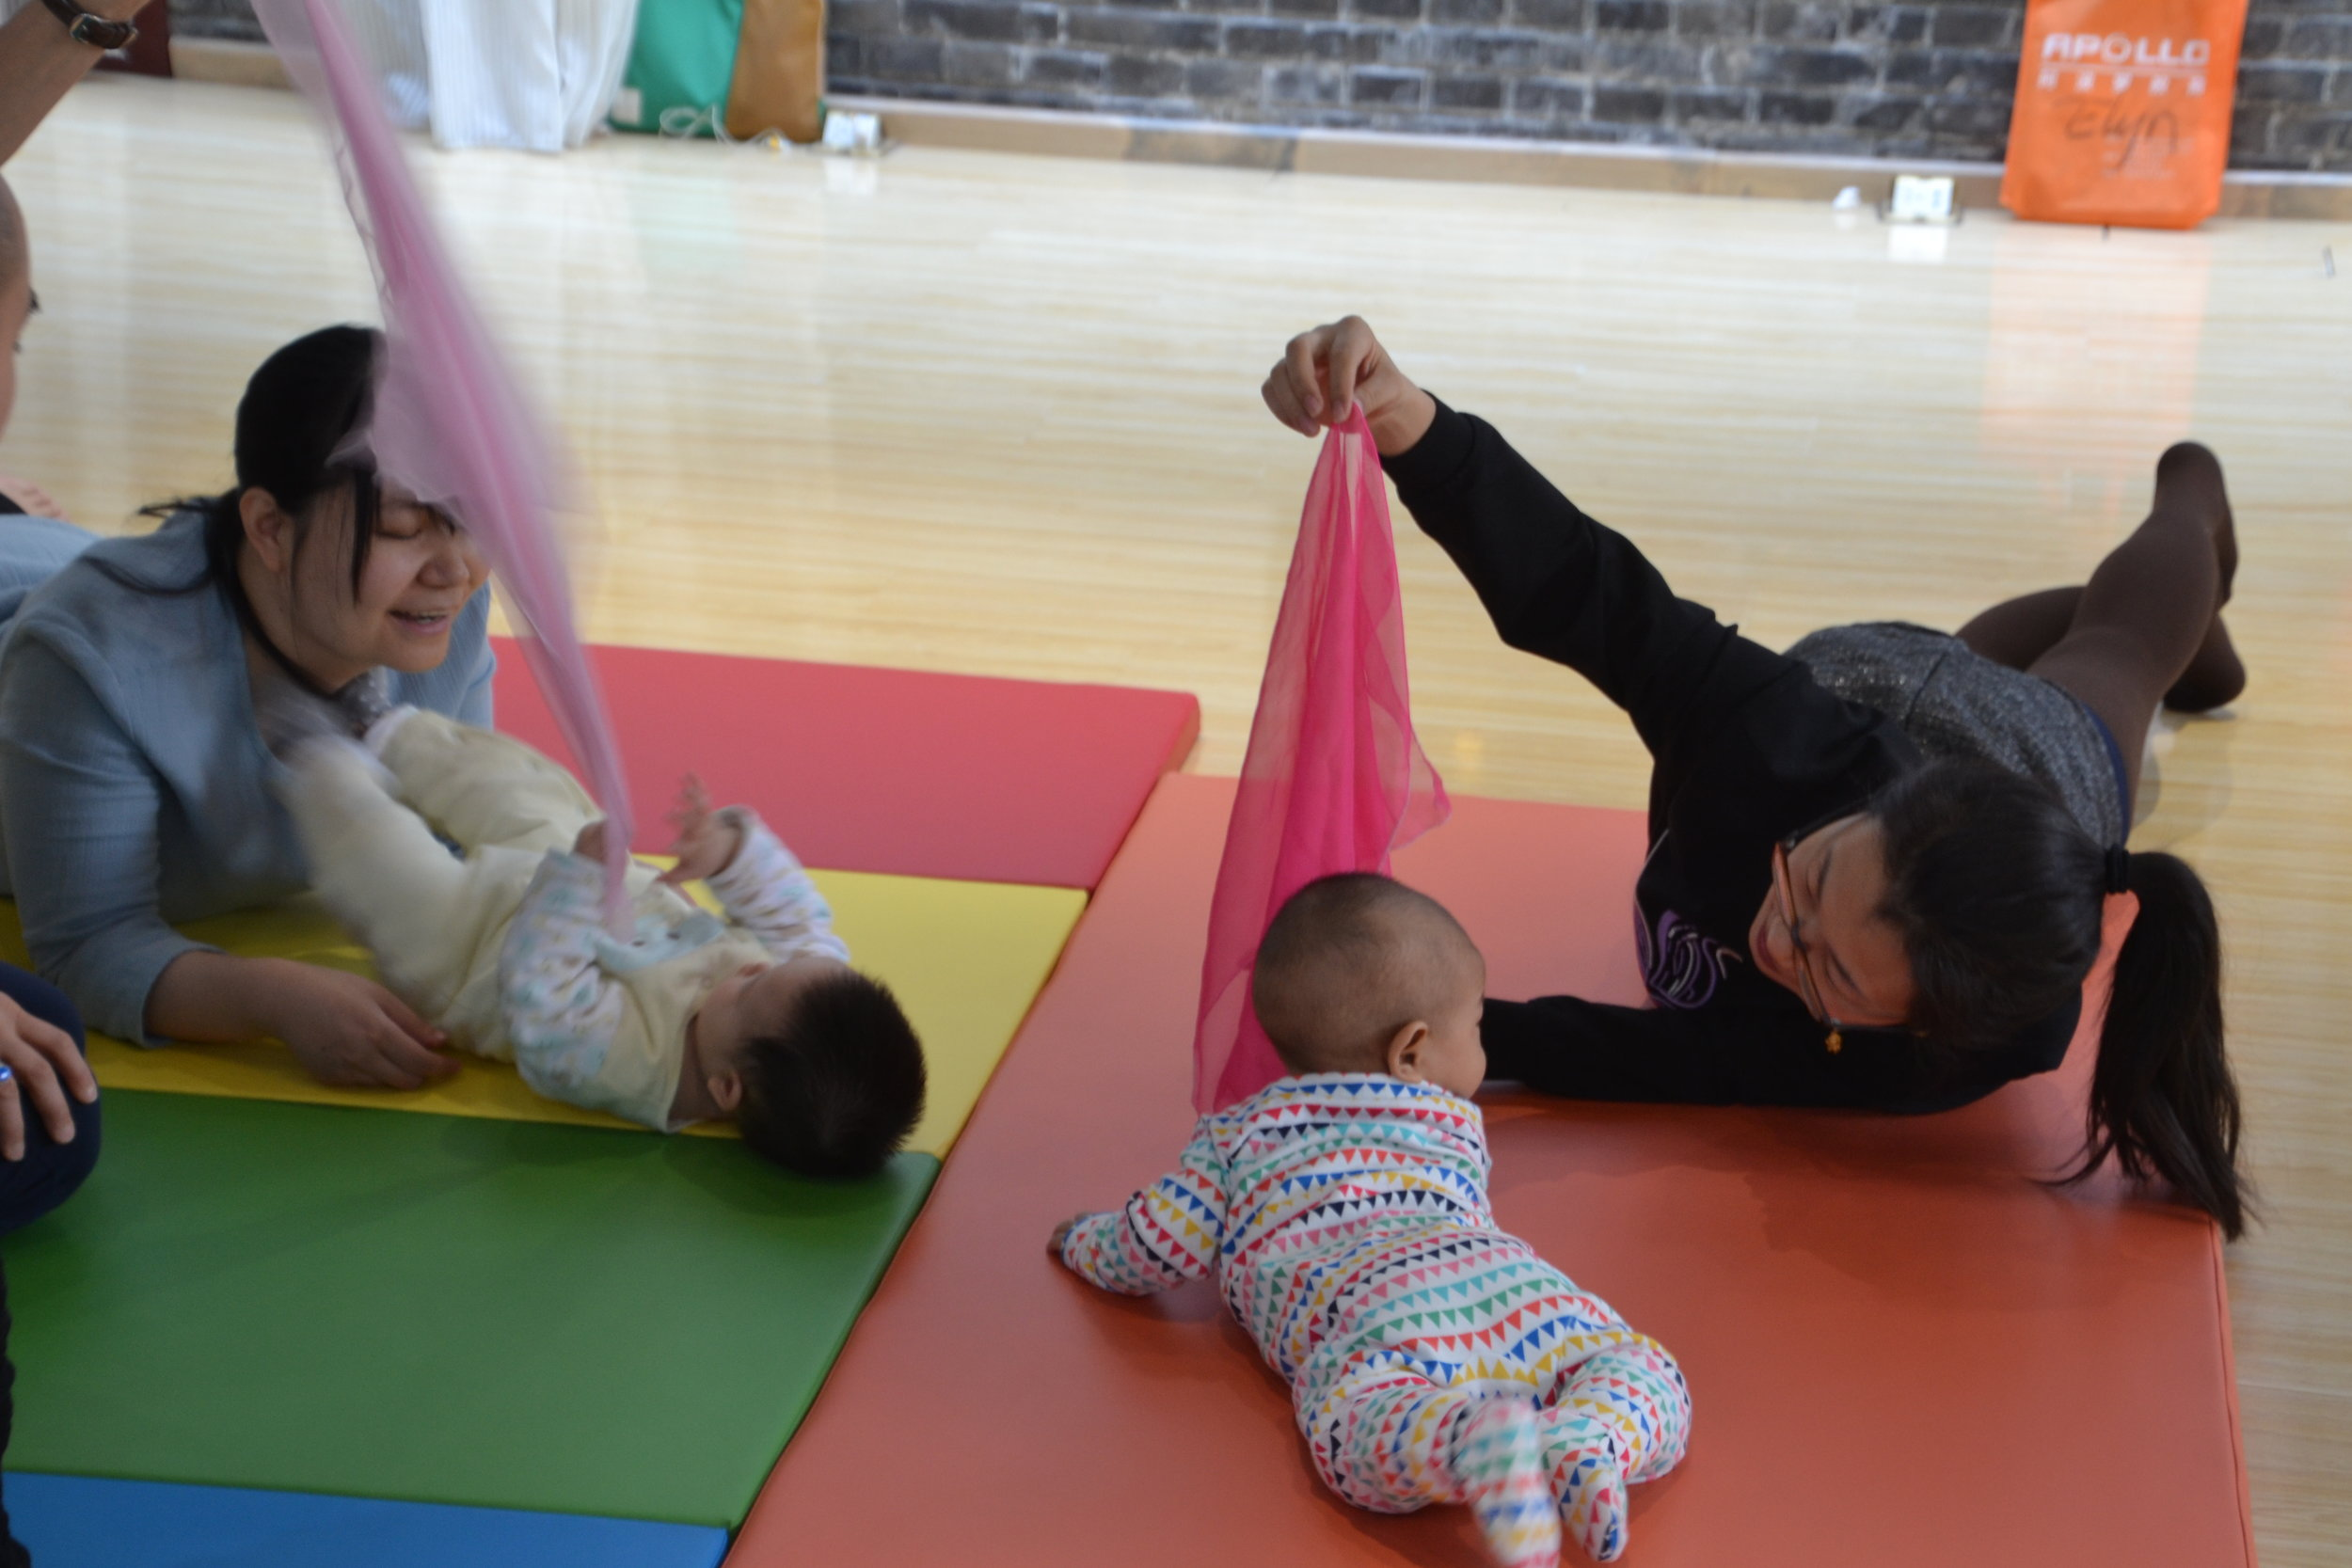 rolling baby_Mom baby belly scarf 3.JPG